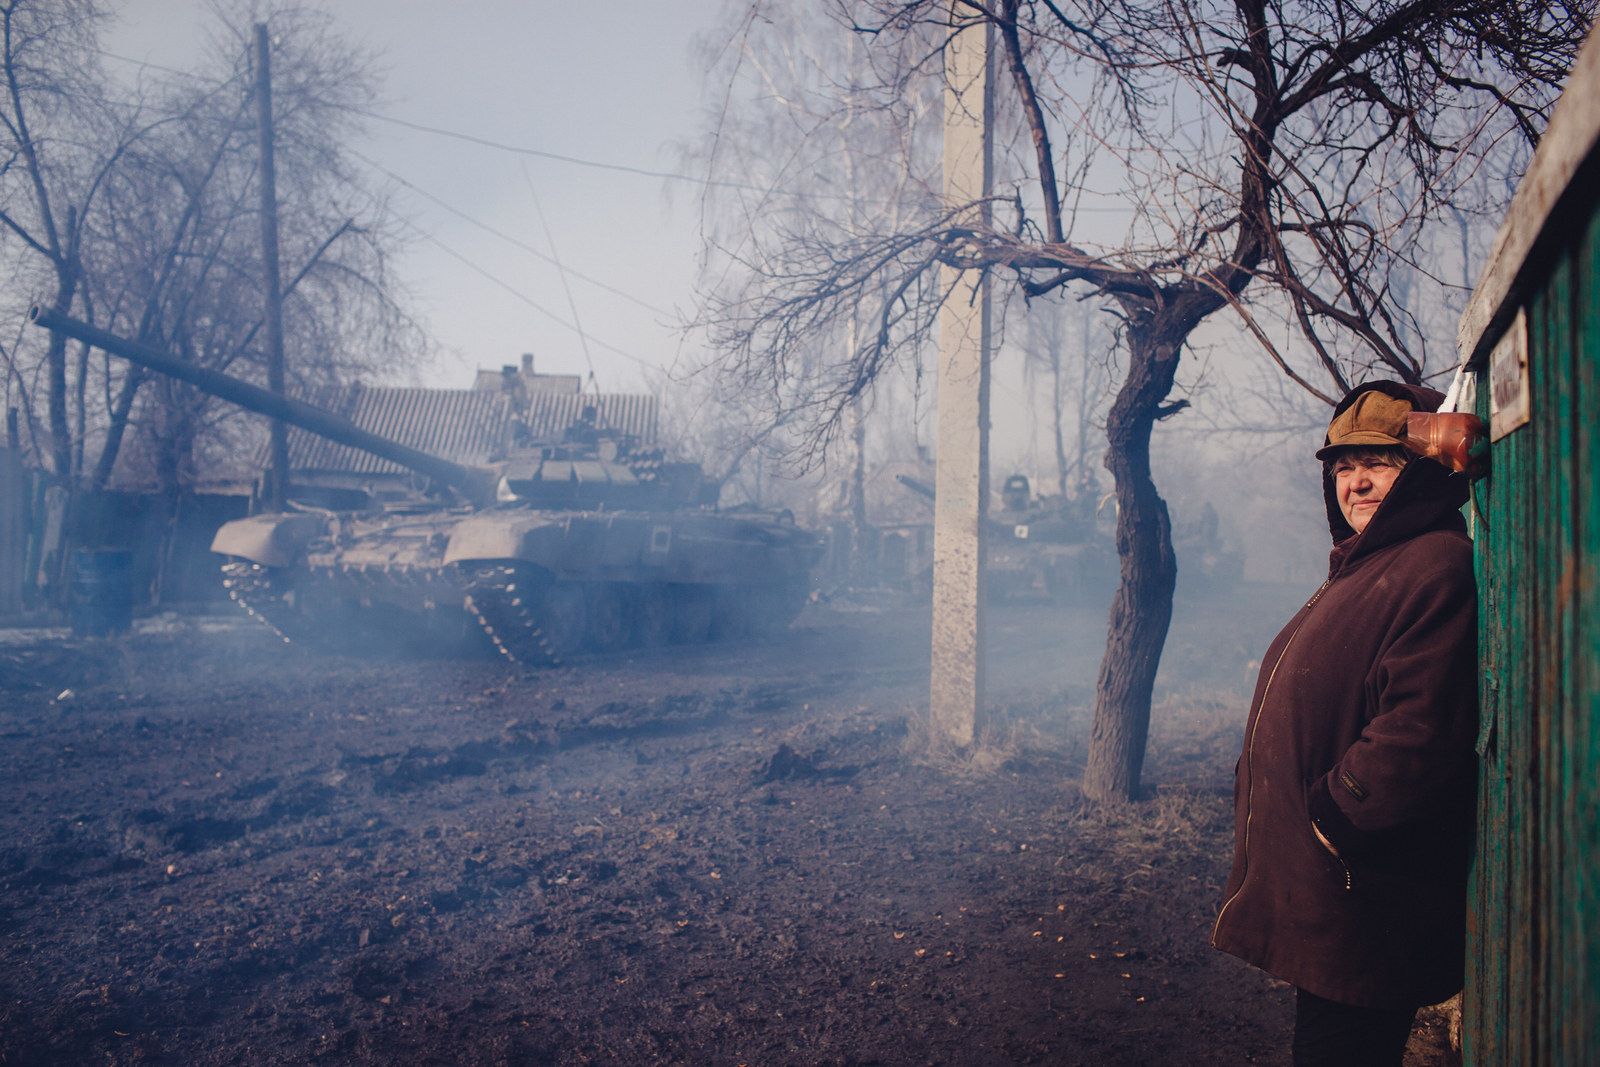 Бои в пригороде Дебальцево, зима 2015 г.